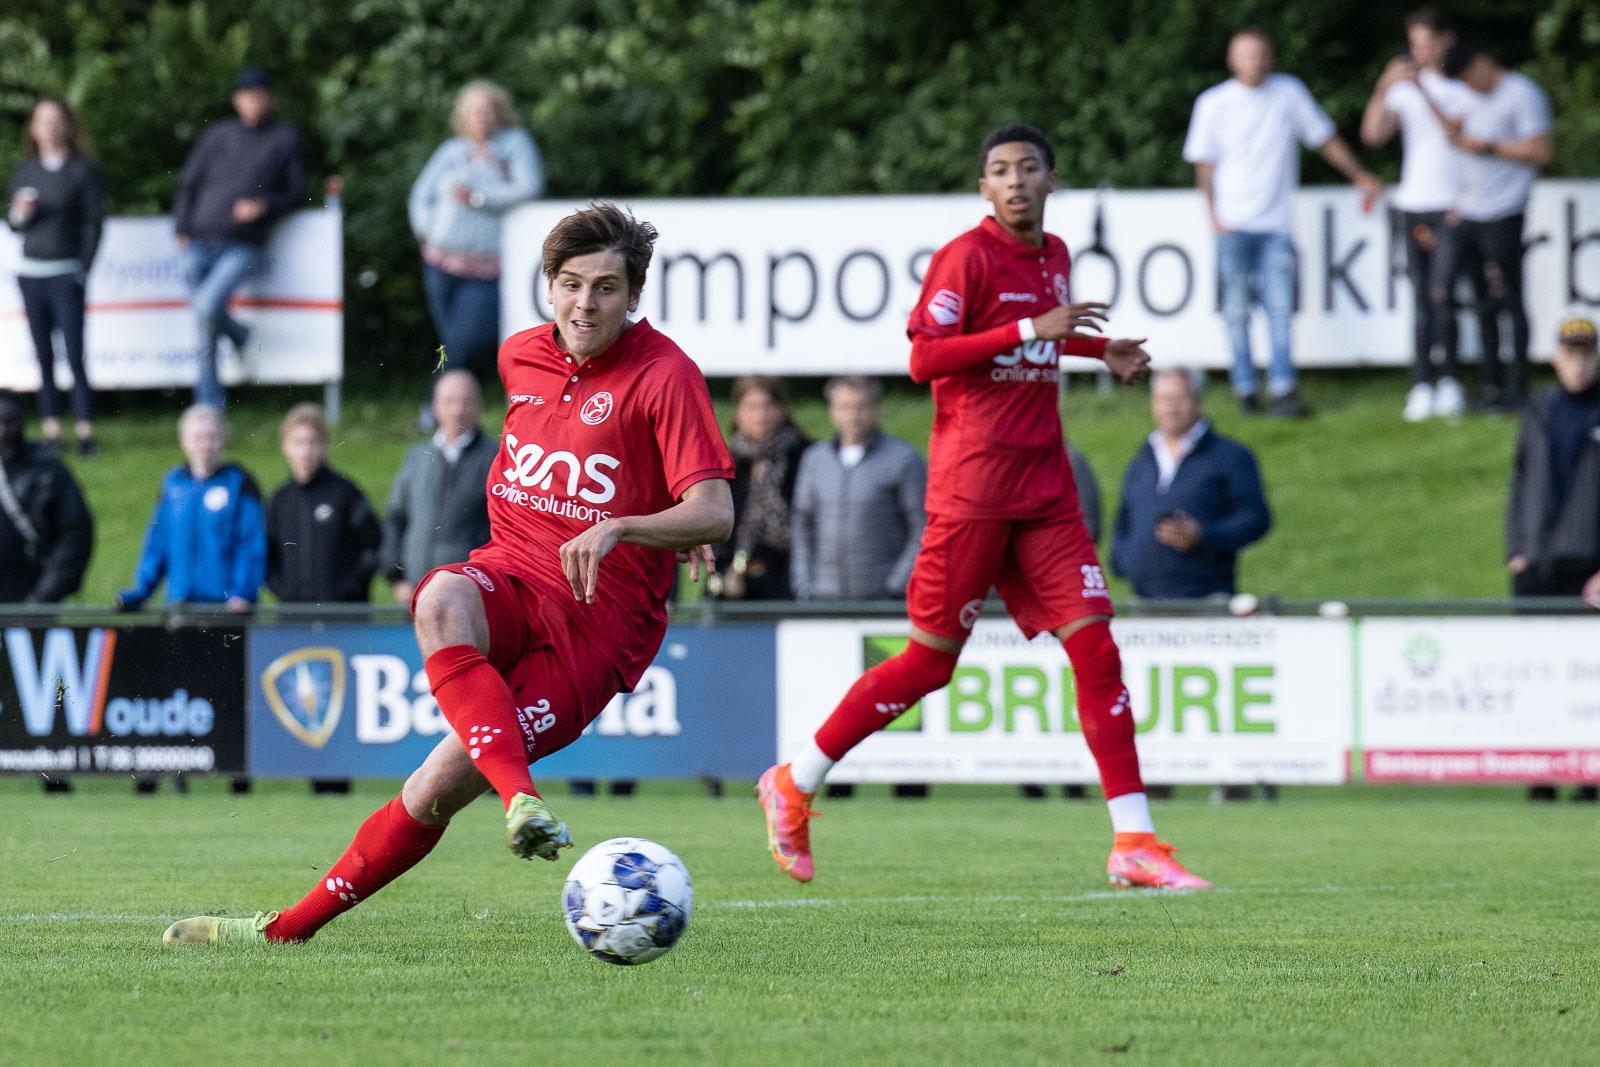 Update: Oefenprogramma Almere City FC